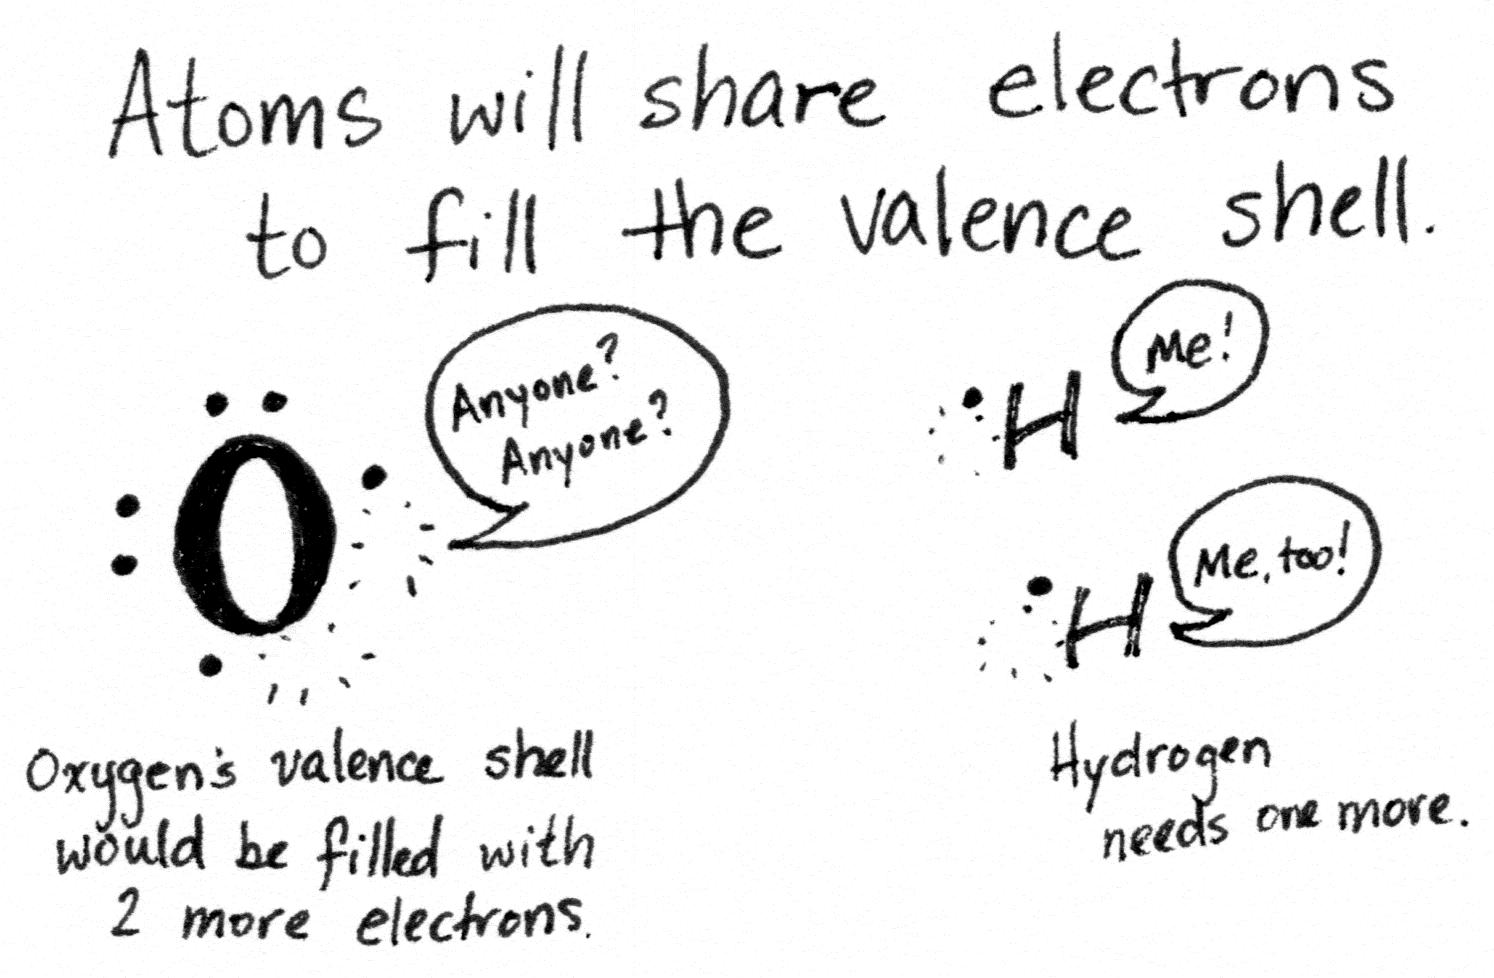 https://lostechies.com/sharoncichelli/2014/08/29/how-transistors-work/